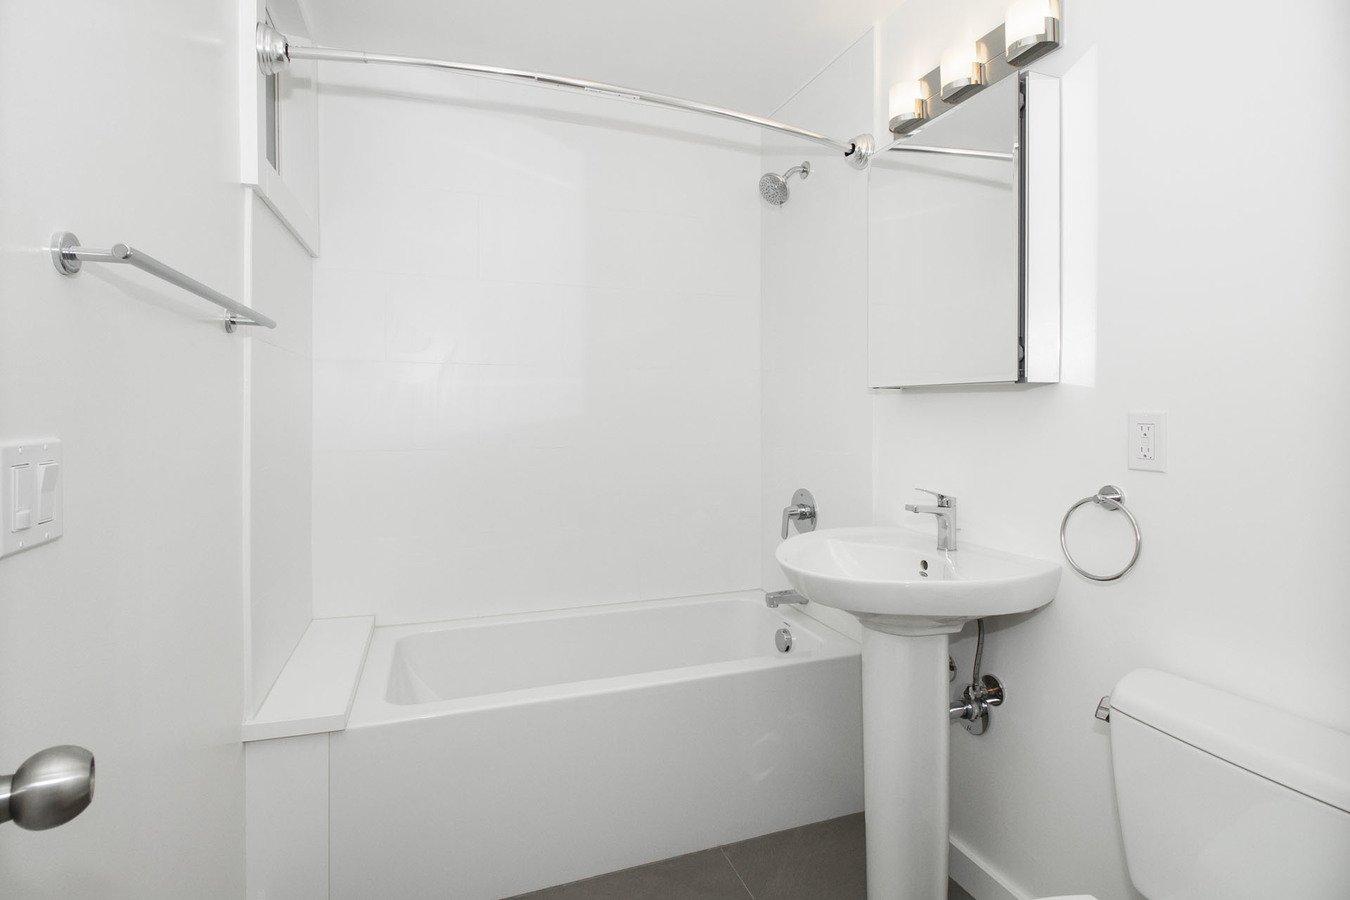 Studio 1 Bathroom Apartment for rent at 990 FULTON Apartments in San Francisco, CA